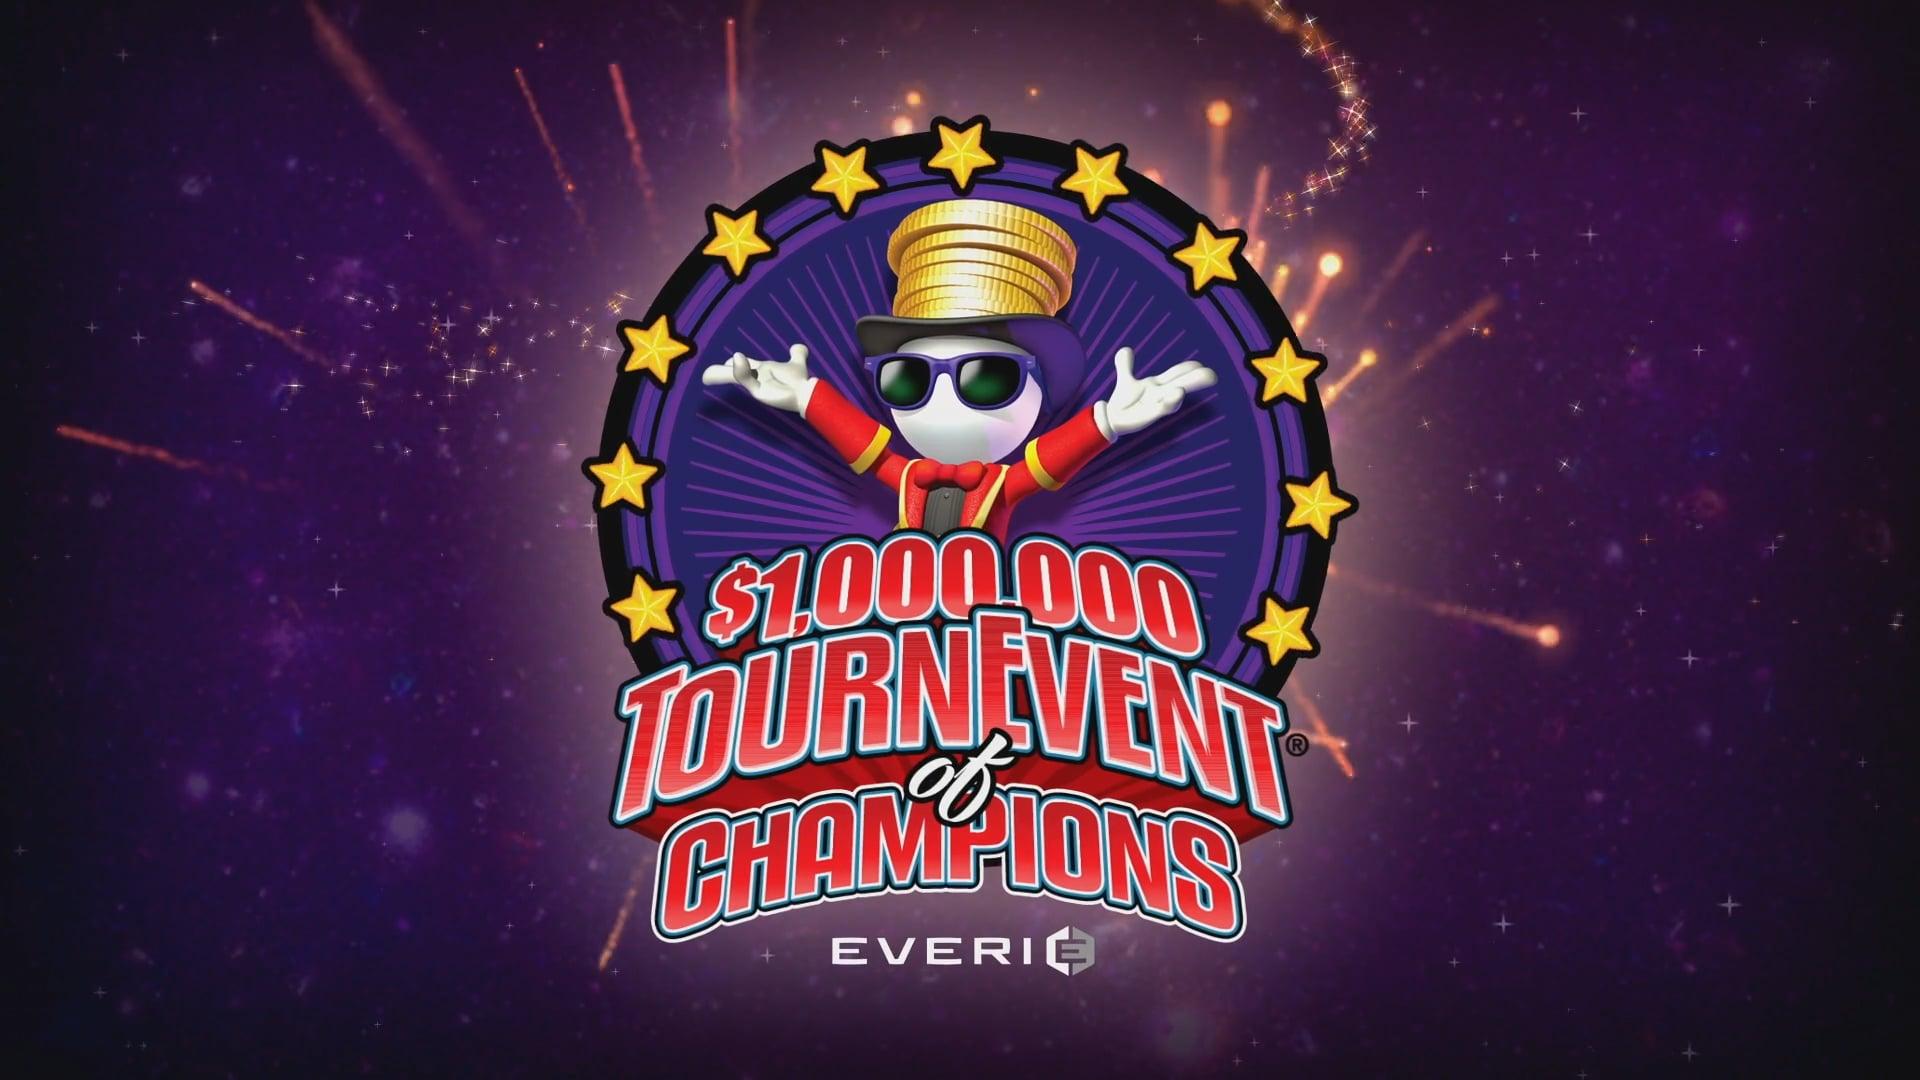 Tournevent of Champions at Chinook Winds Casino & Resort